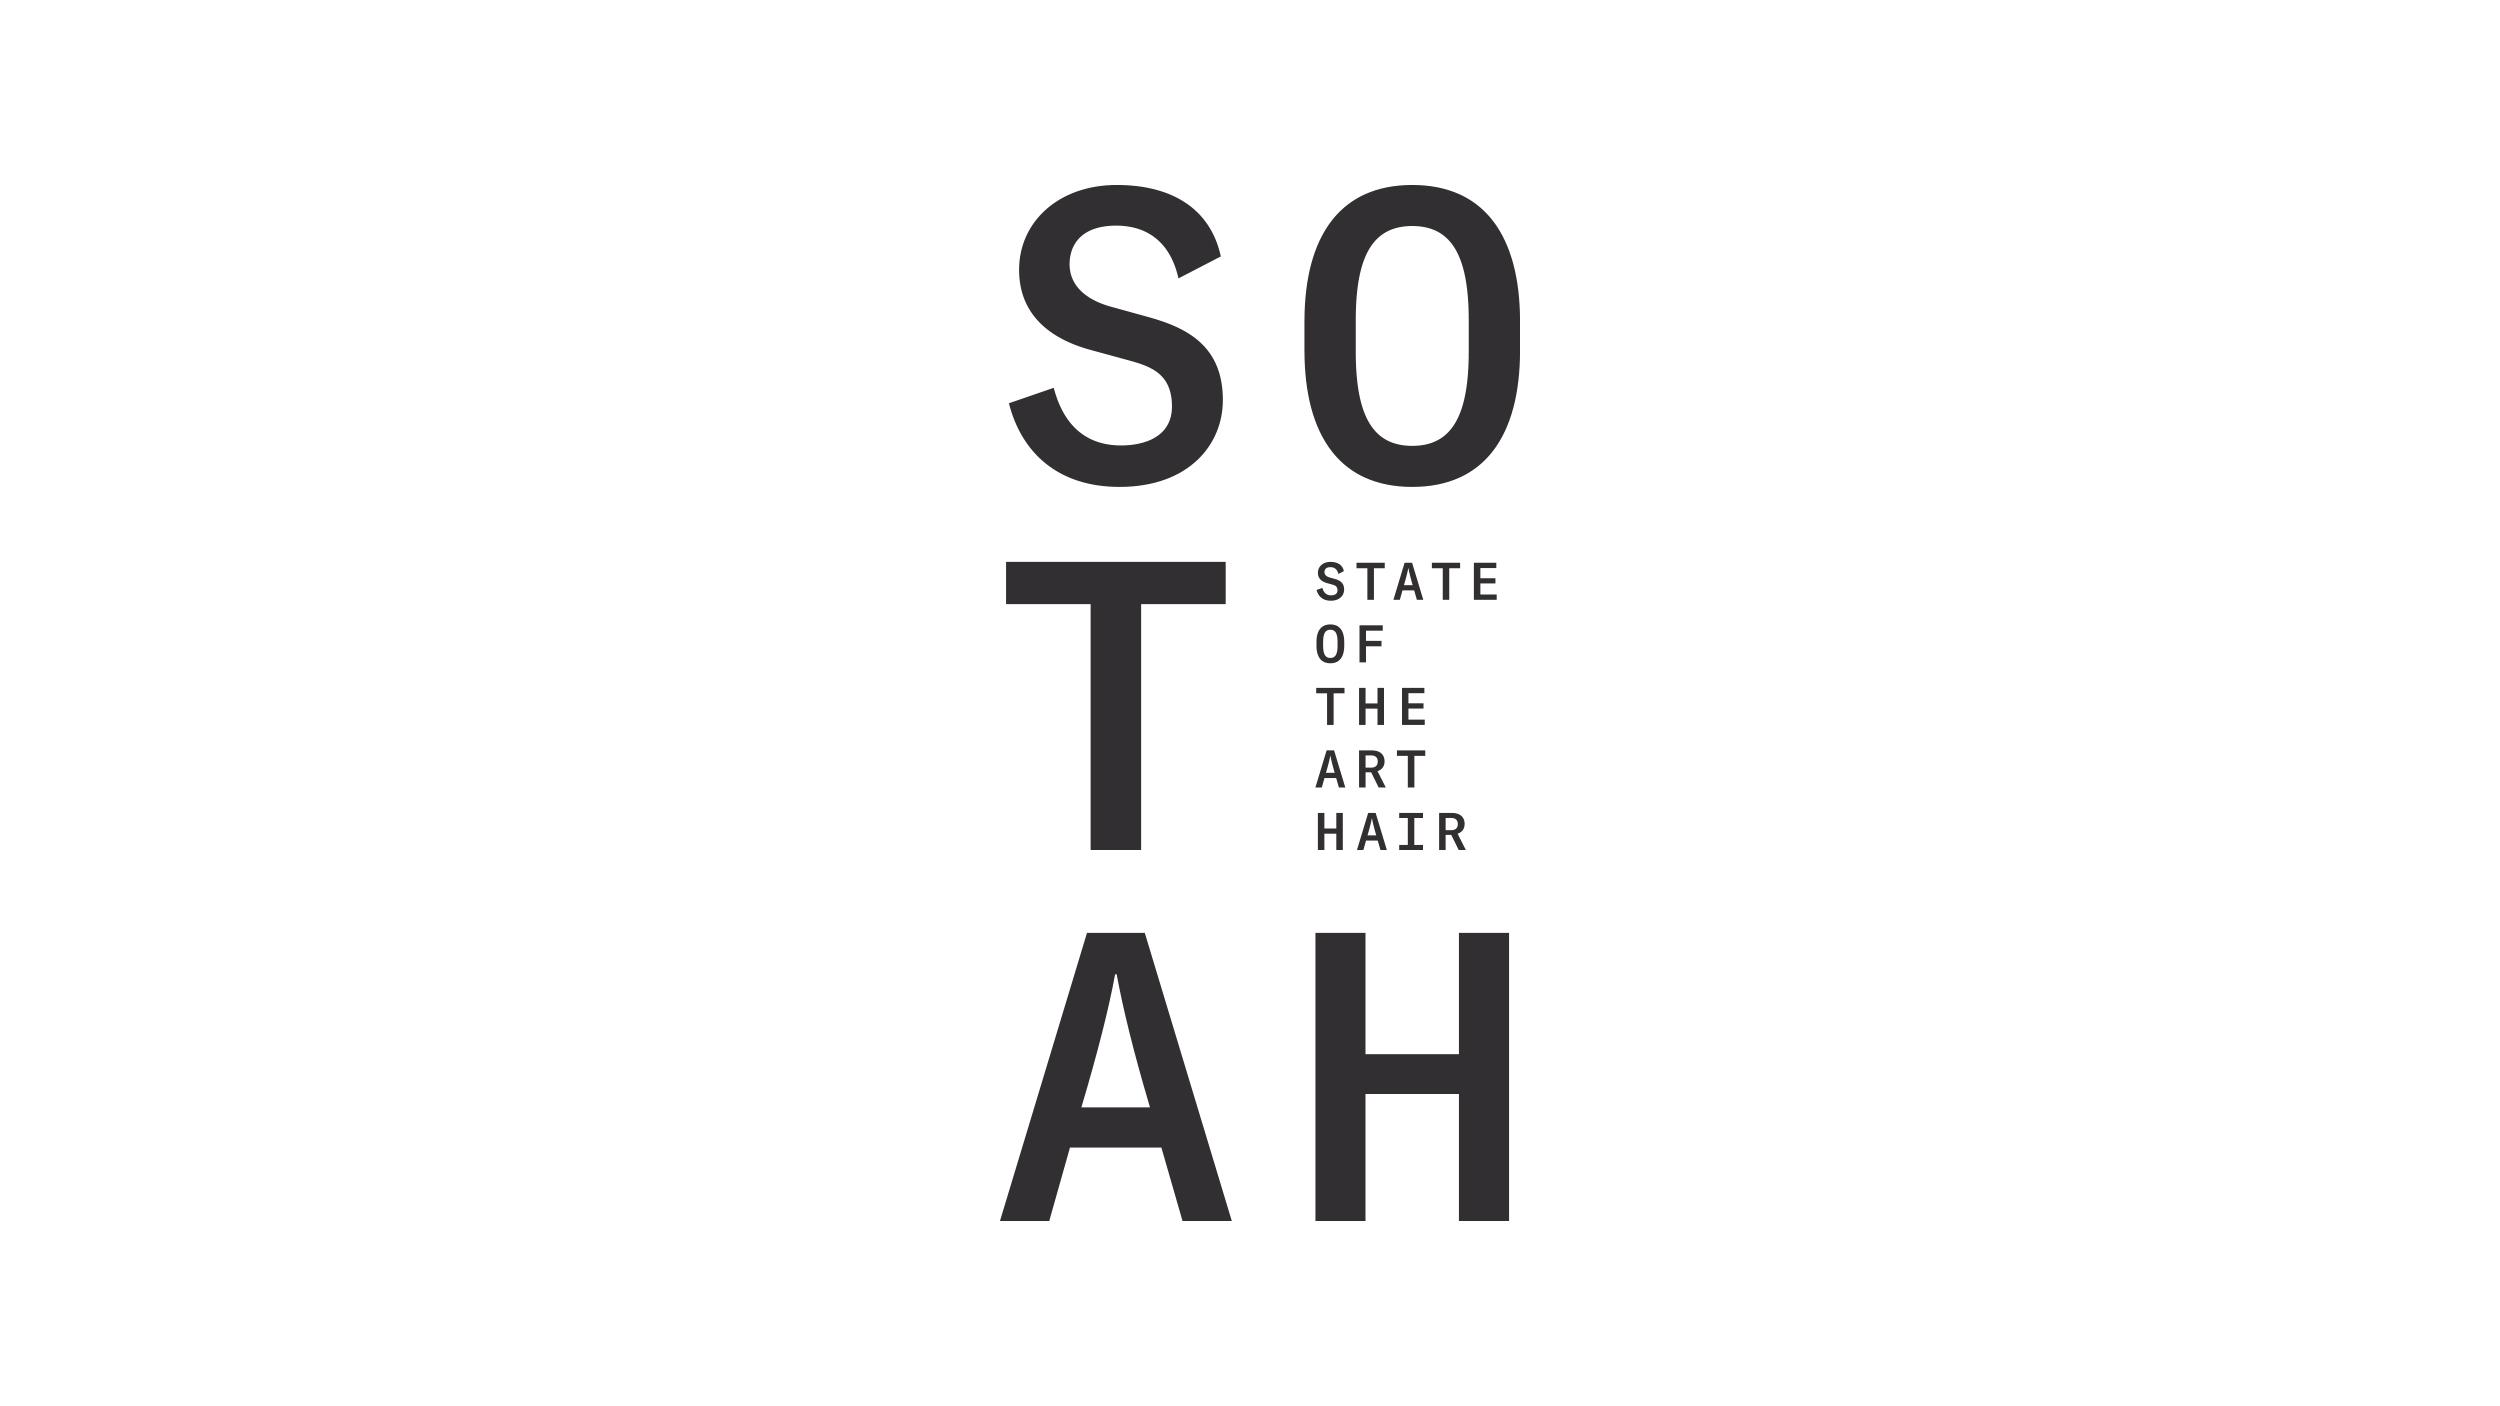 MRB_Web_SOTAH_02A.jpg